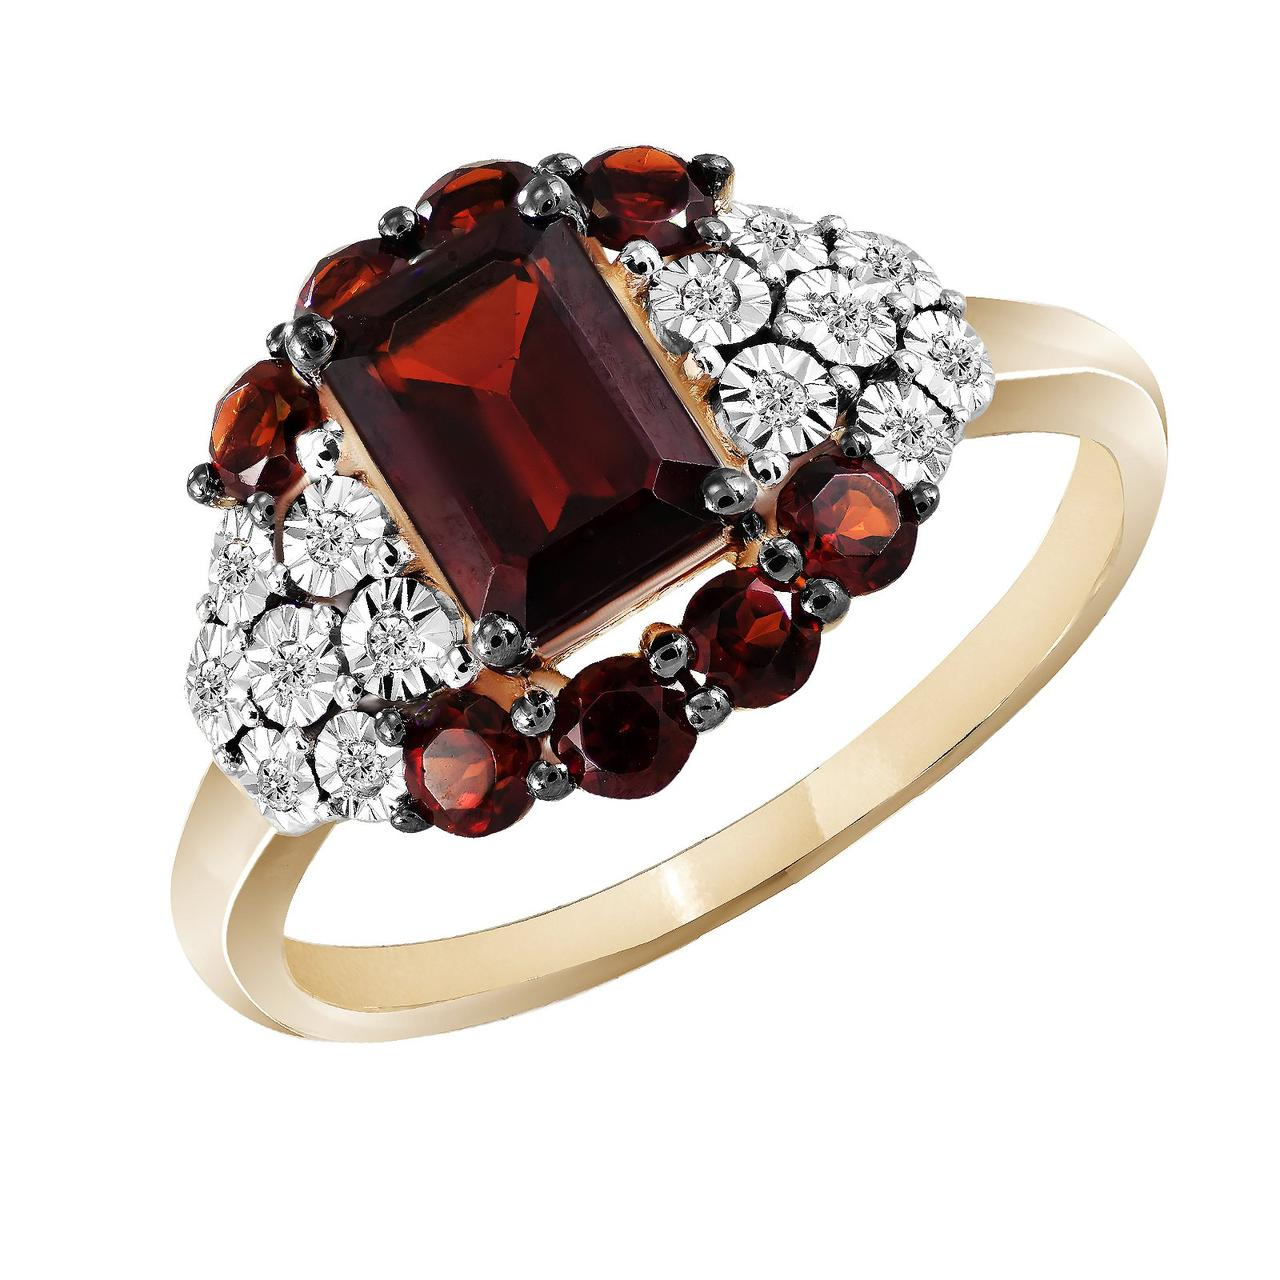 Золотое кольцо с бриллиантами и гранатами, размер 17 (822593)